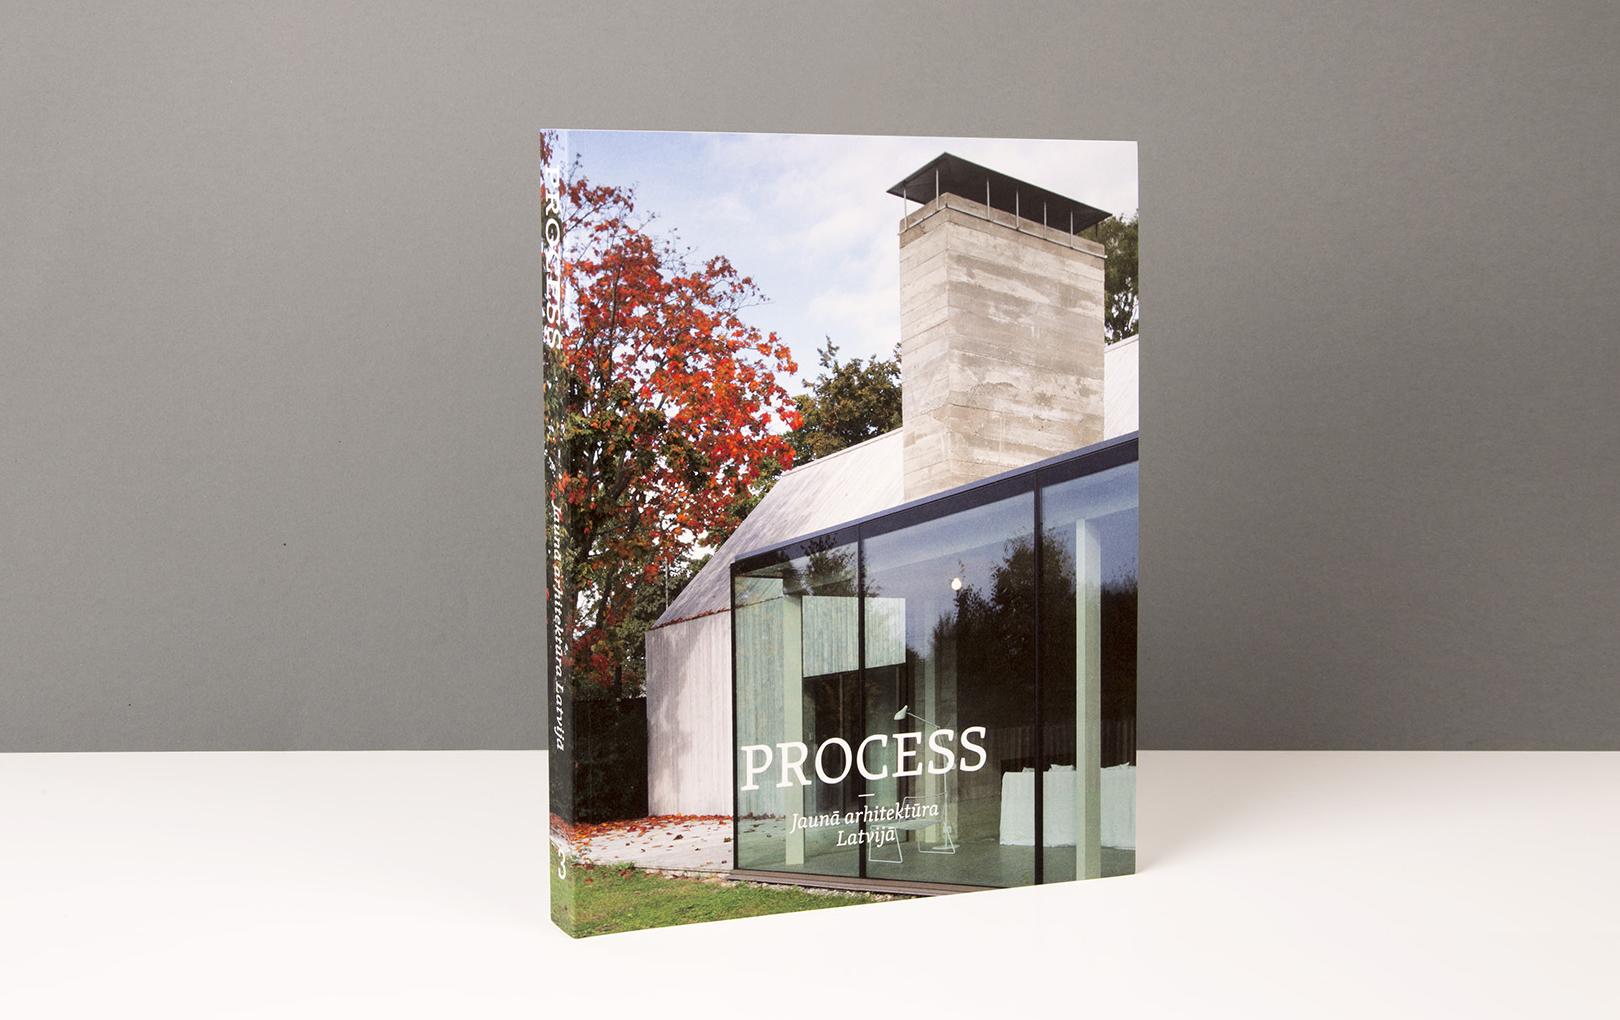 Process 3. New Architecture in Latvia